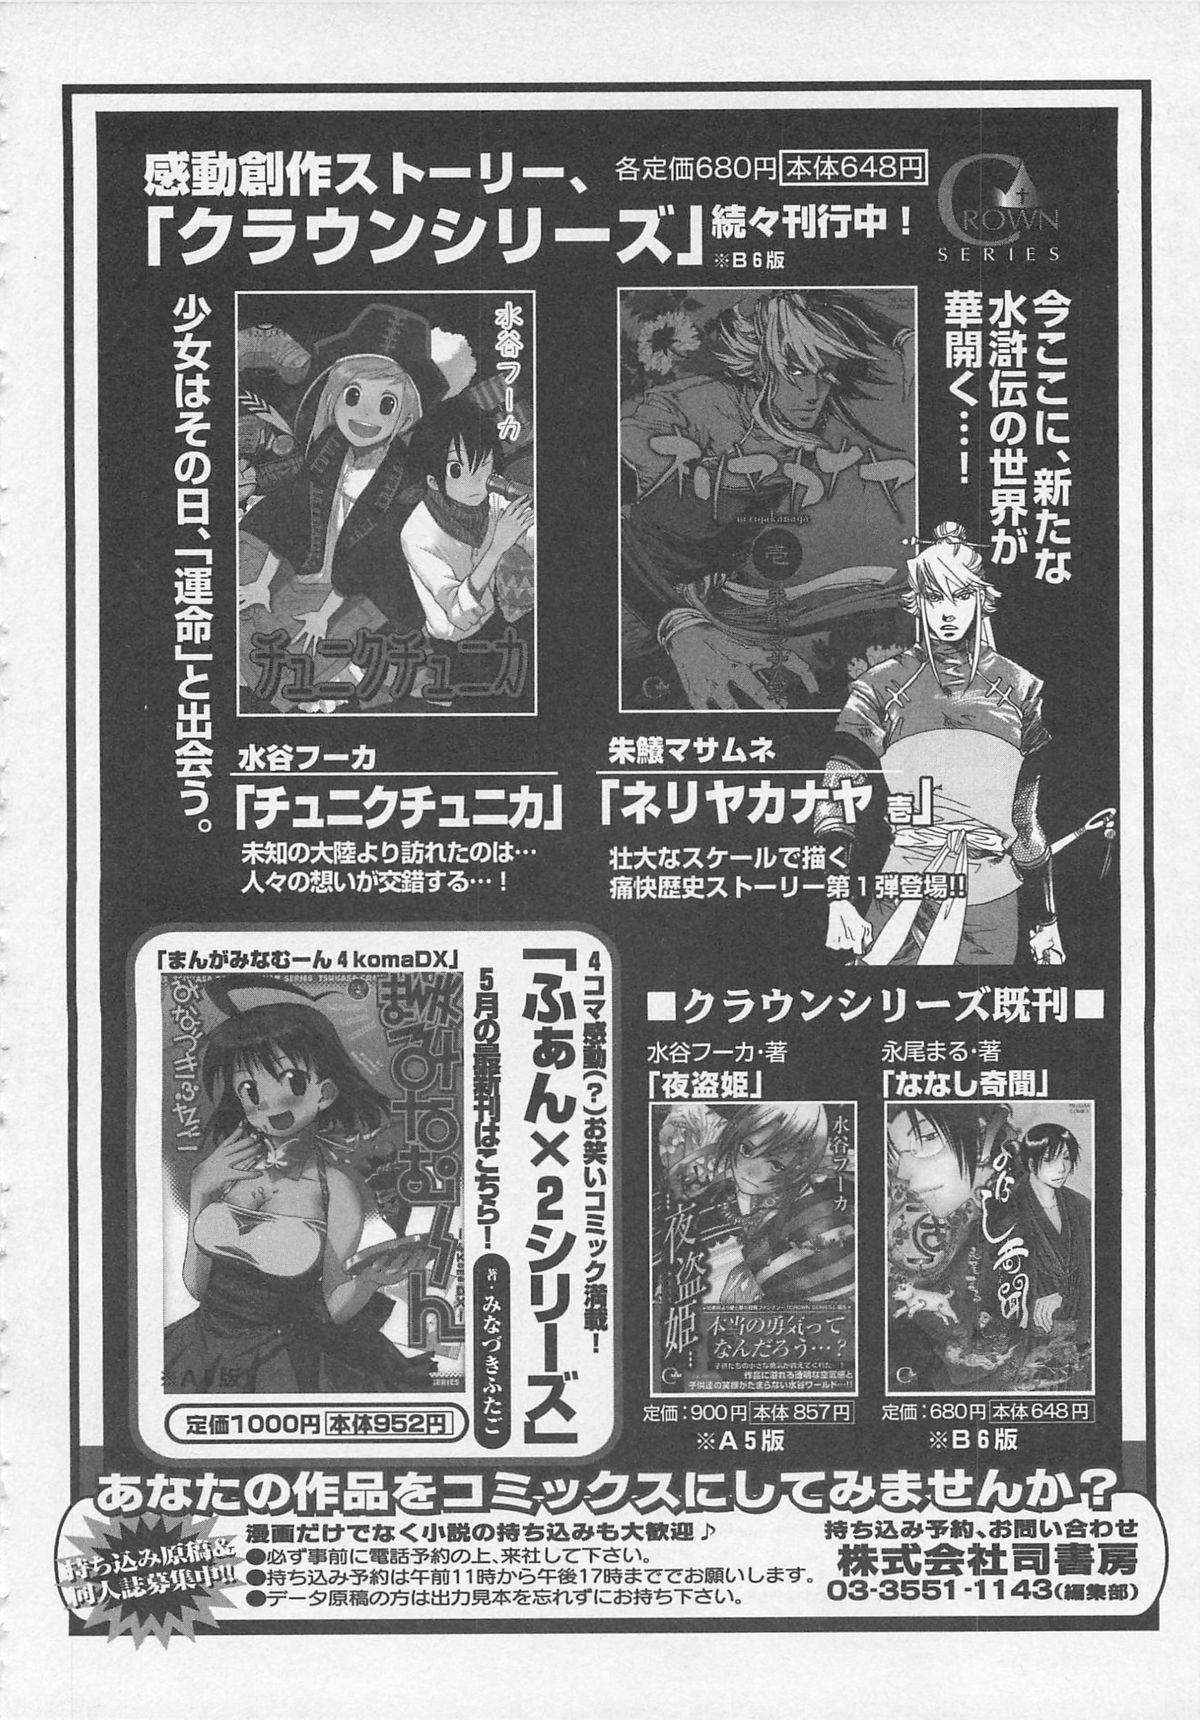 Otokonoko HEAVEN Vol. 02 Dokidoki Chikan Taiken 38